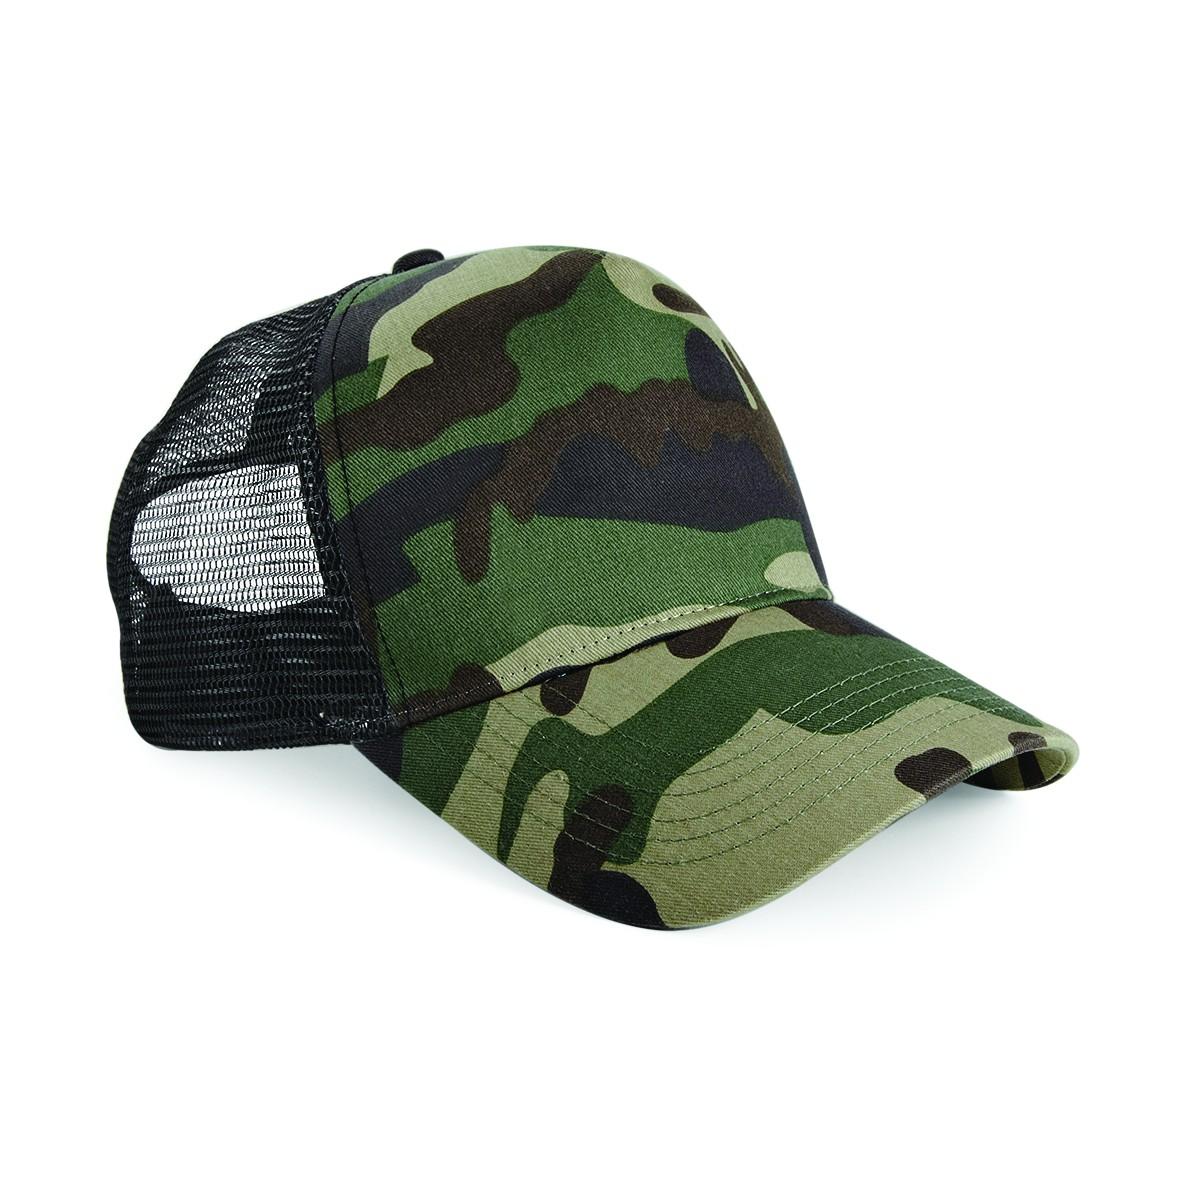 Beachfield Womens Camp Print Mesh Truckers Snapback Casual Hip Hop Hat One Size